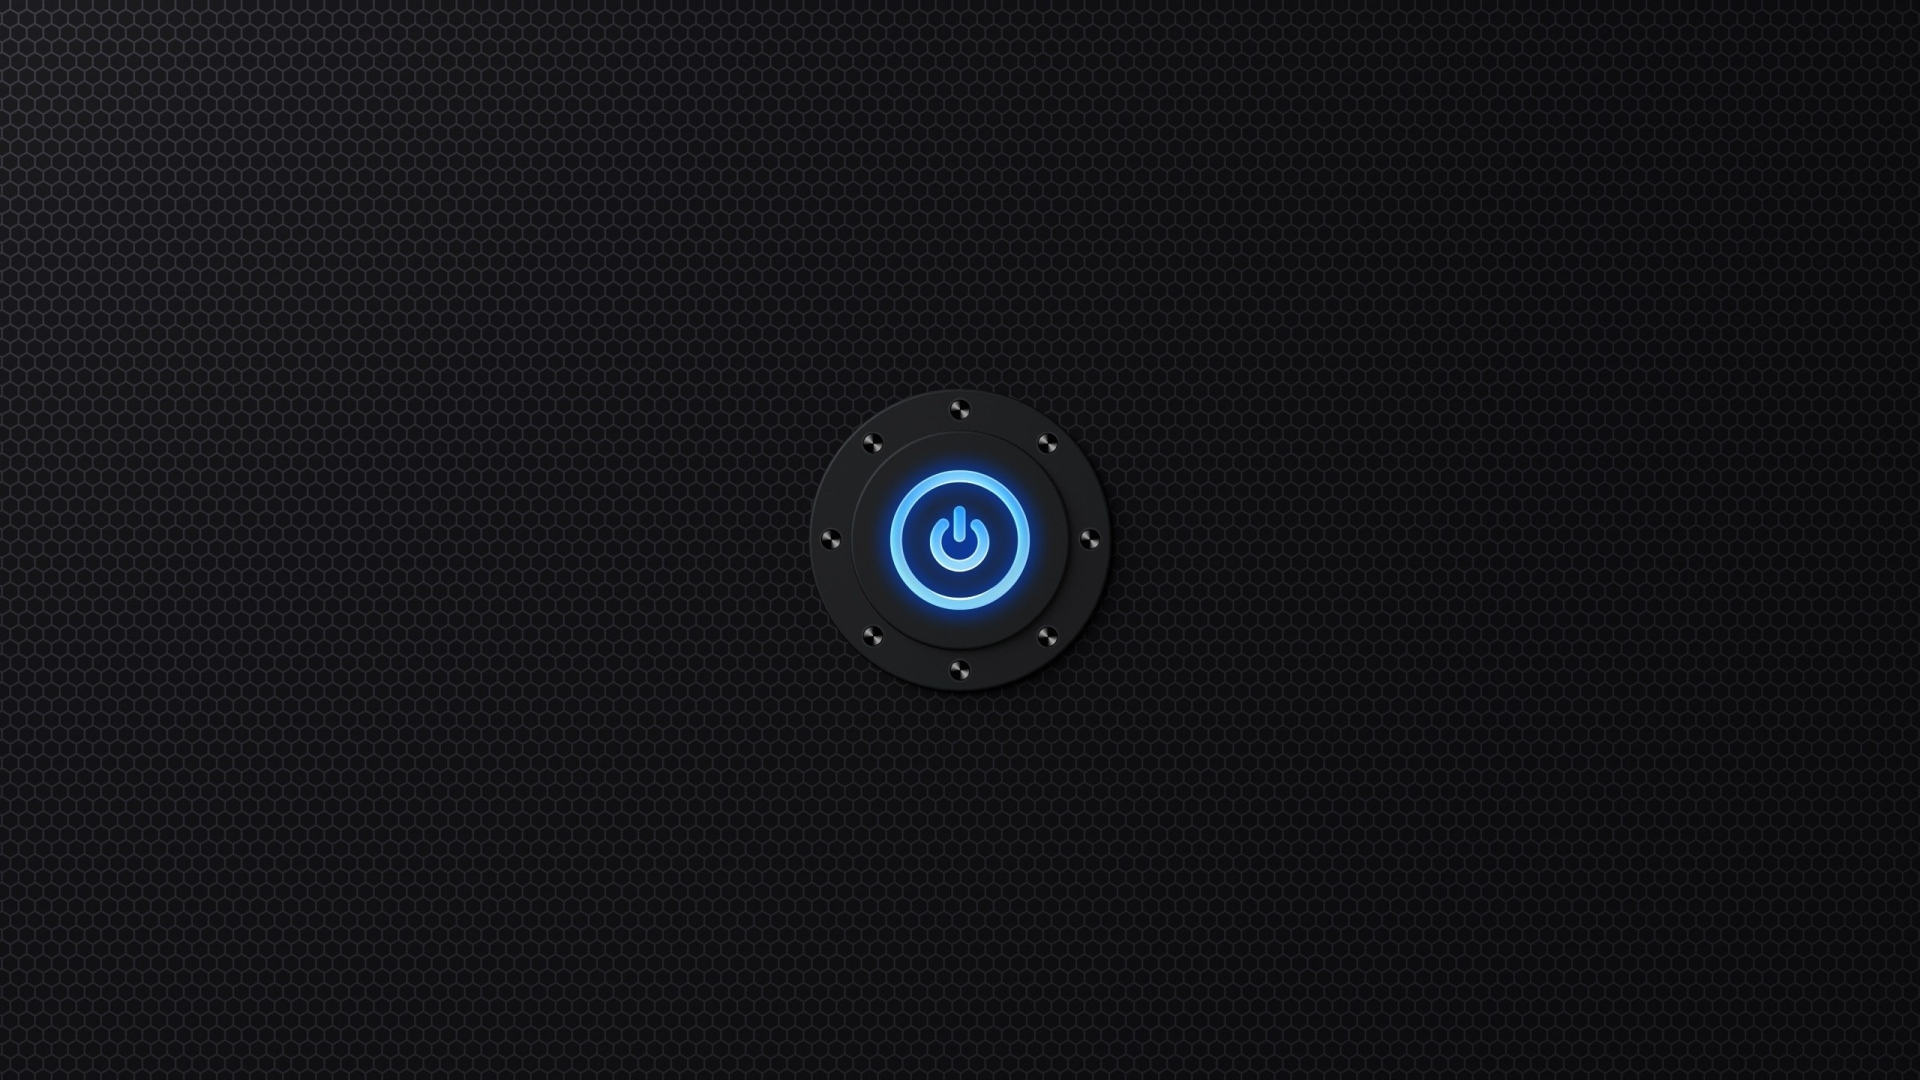 download wallpaper 1920x1080 texture, light, button, symbol, neon